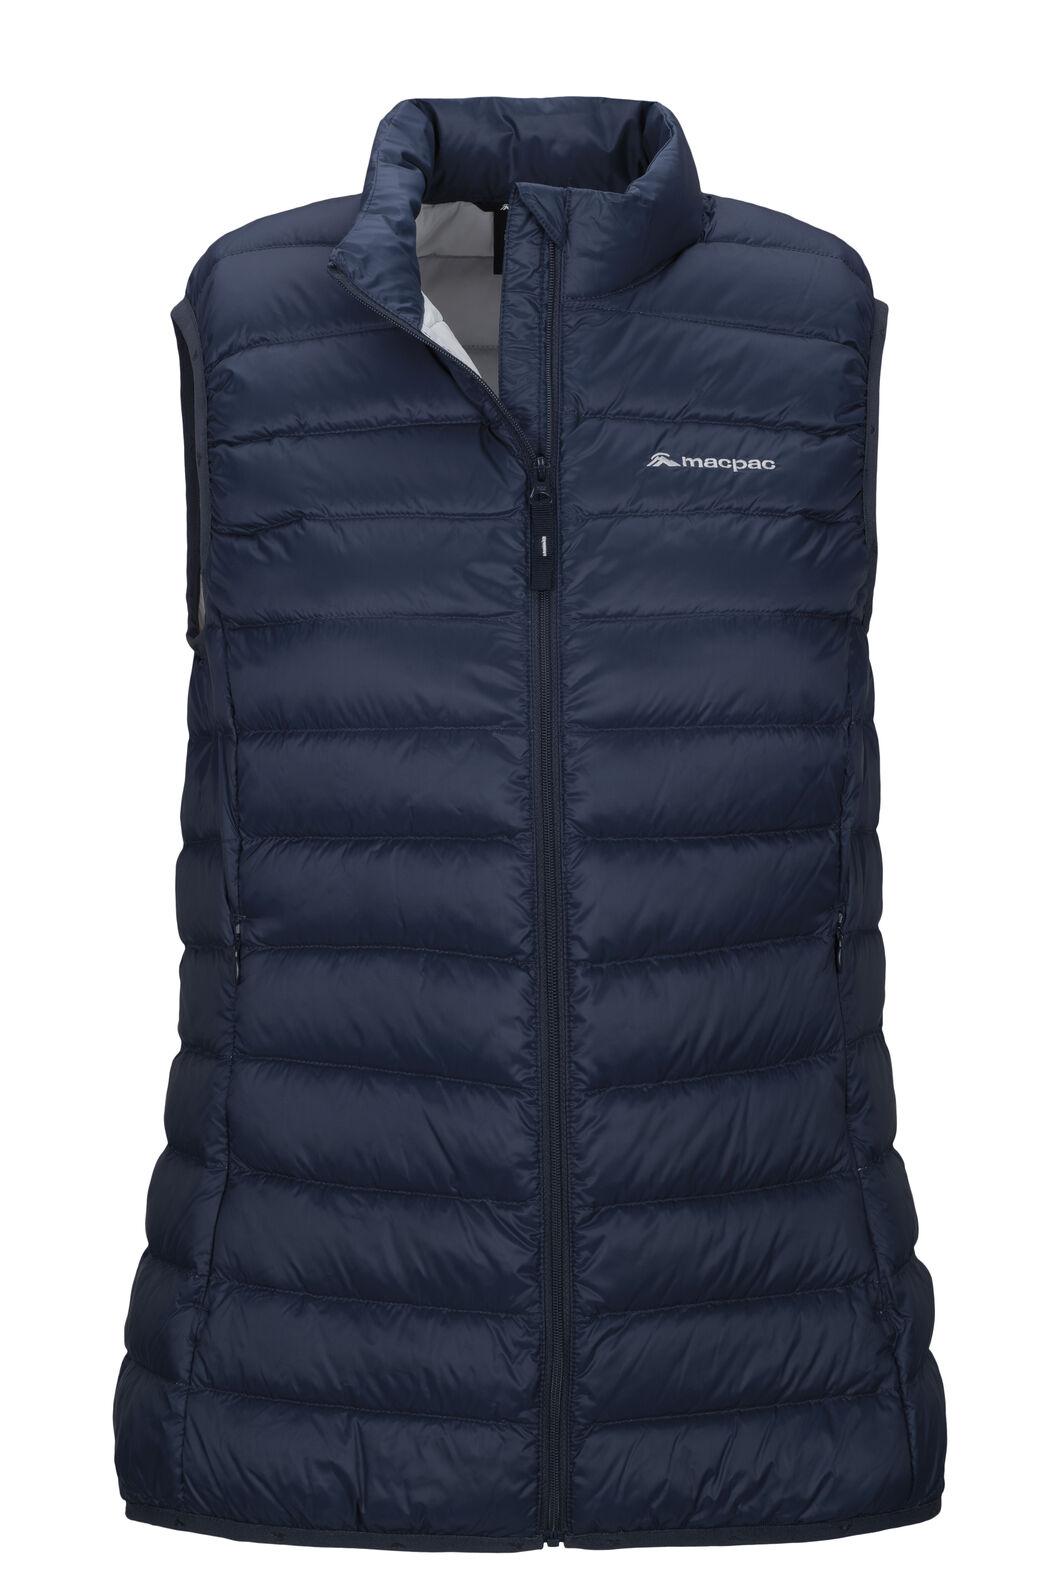 Macpac Women's Uber Light Down Vest, Black Iris/Glacier Grey, hi-res